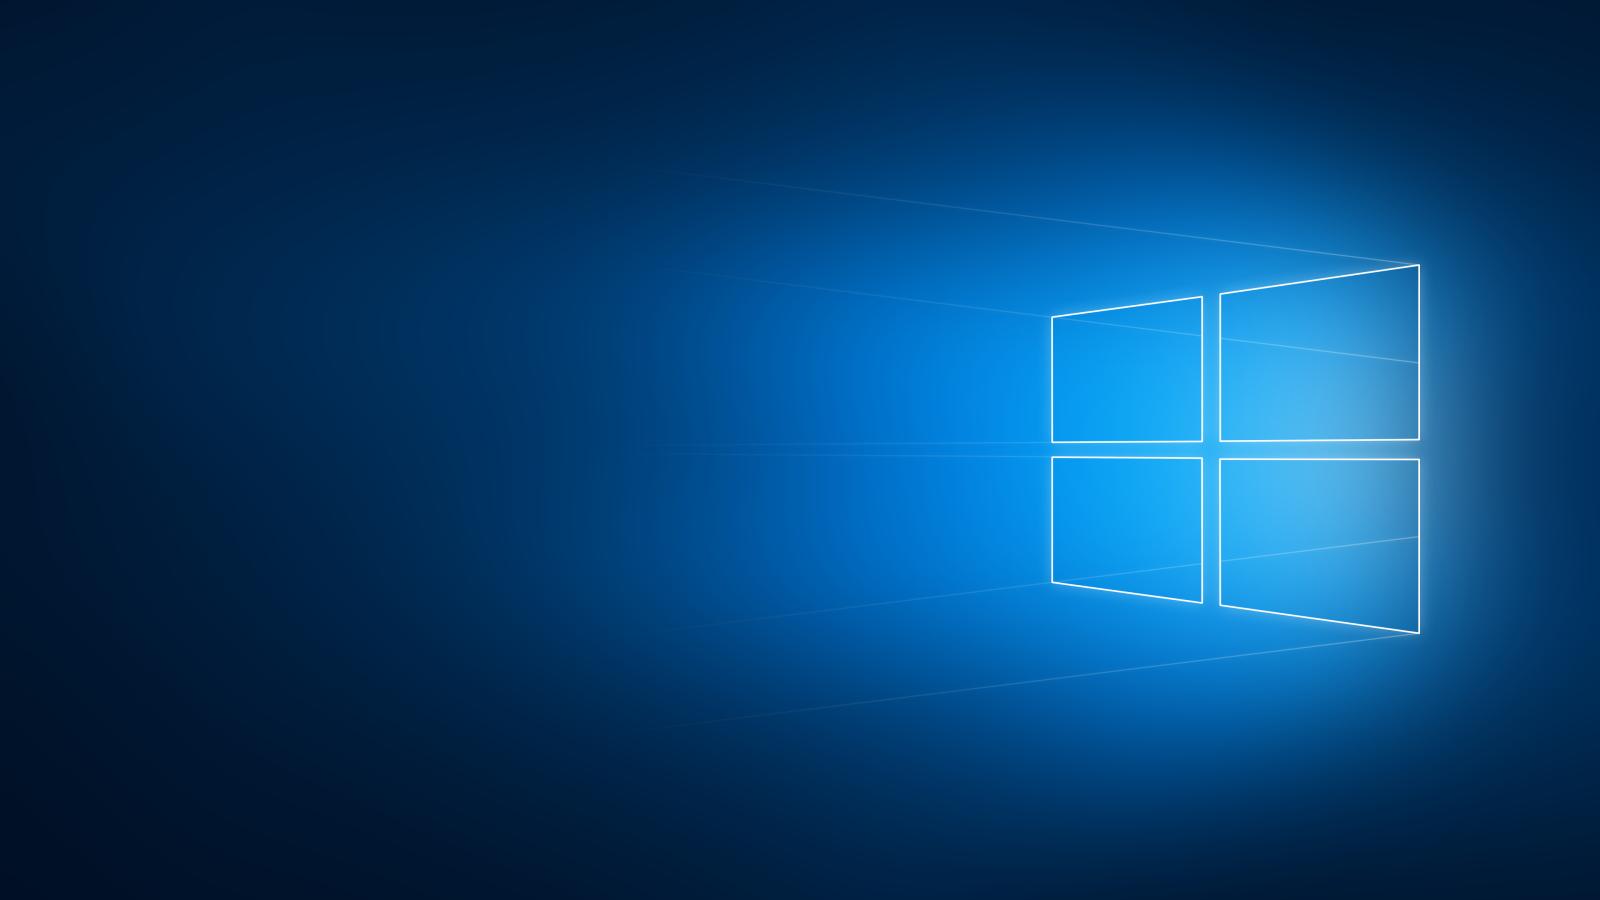 1600x900 Windows 10 Hero Logo 1600x900 Resolution Wallpaper, HD Brands 4K Wallpapers, Images ...